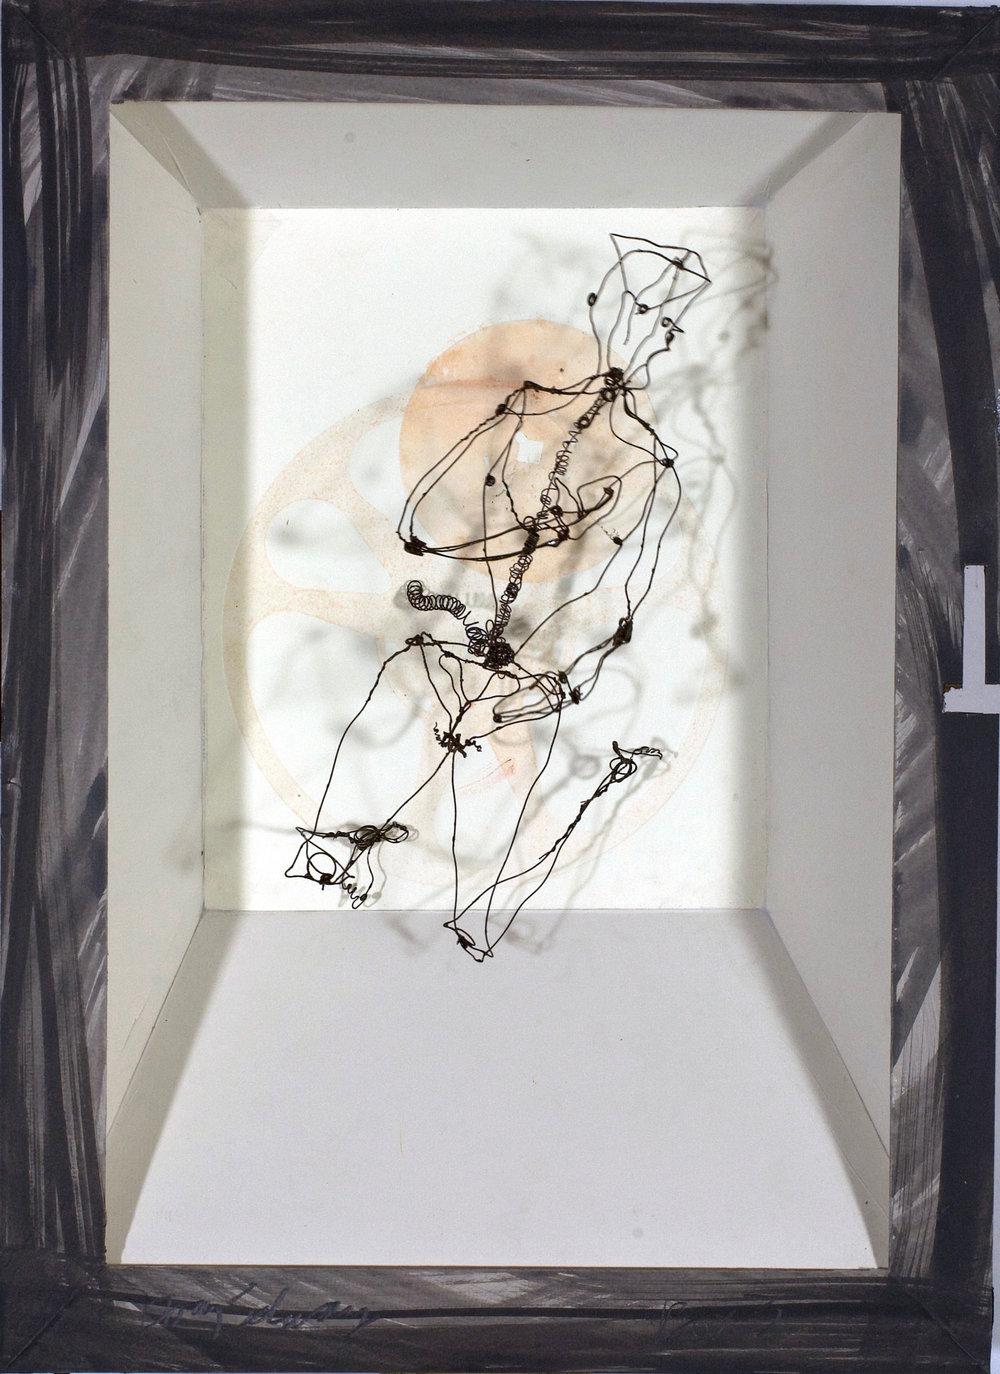 Wire-figure-box-installations-(2).jpg